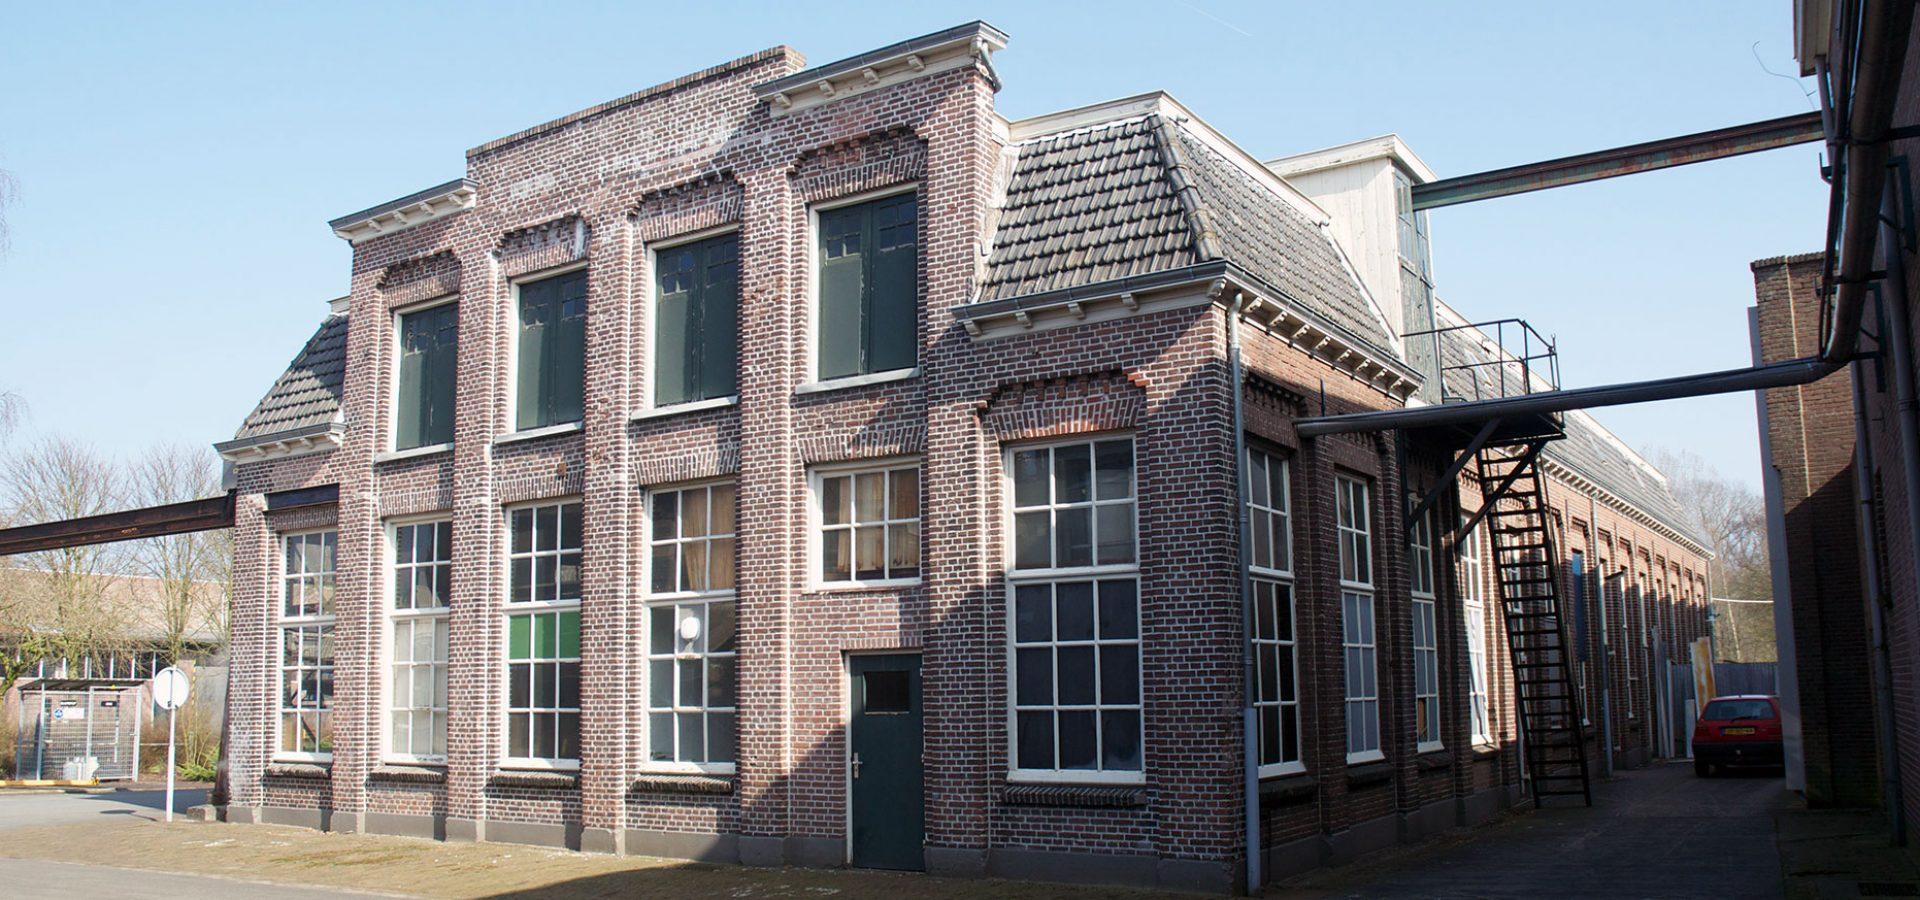 FARO architecten Reggesteyn aan de Regge Nijverdal 01